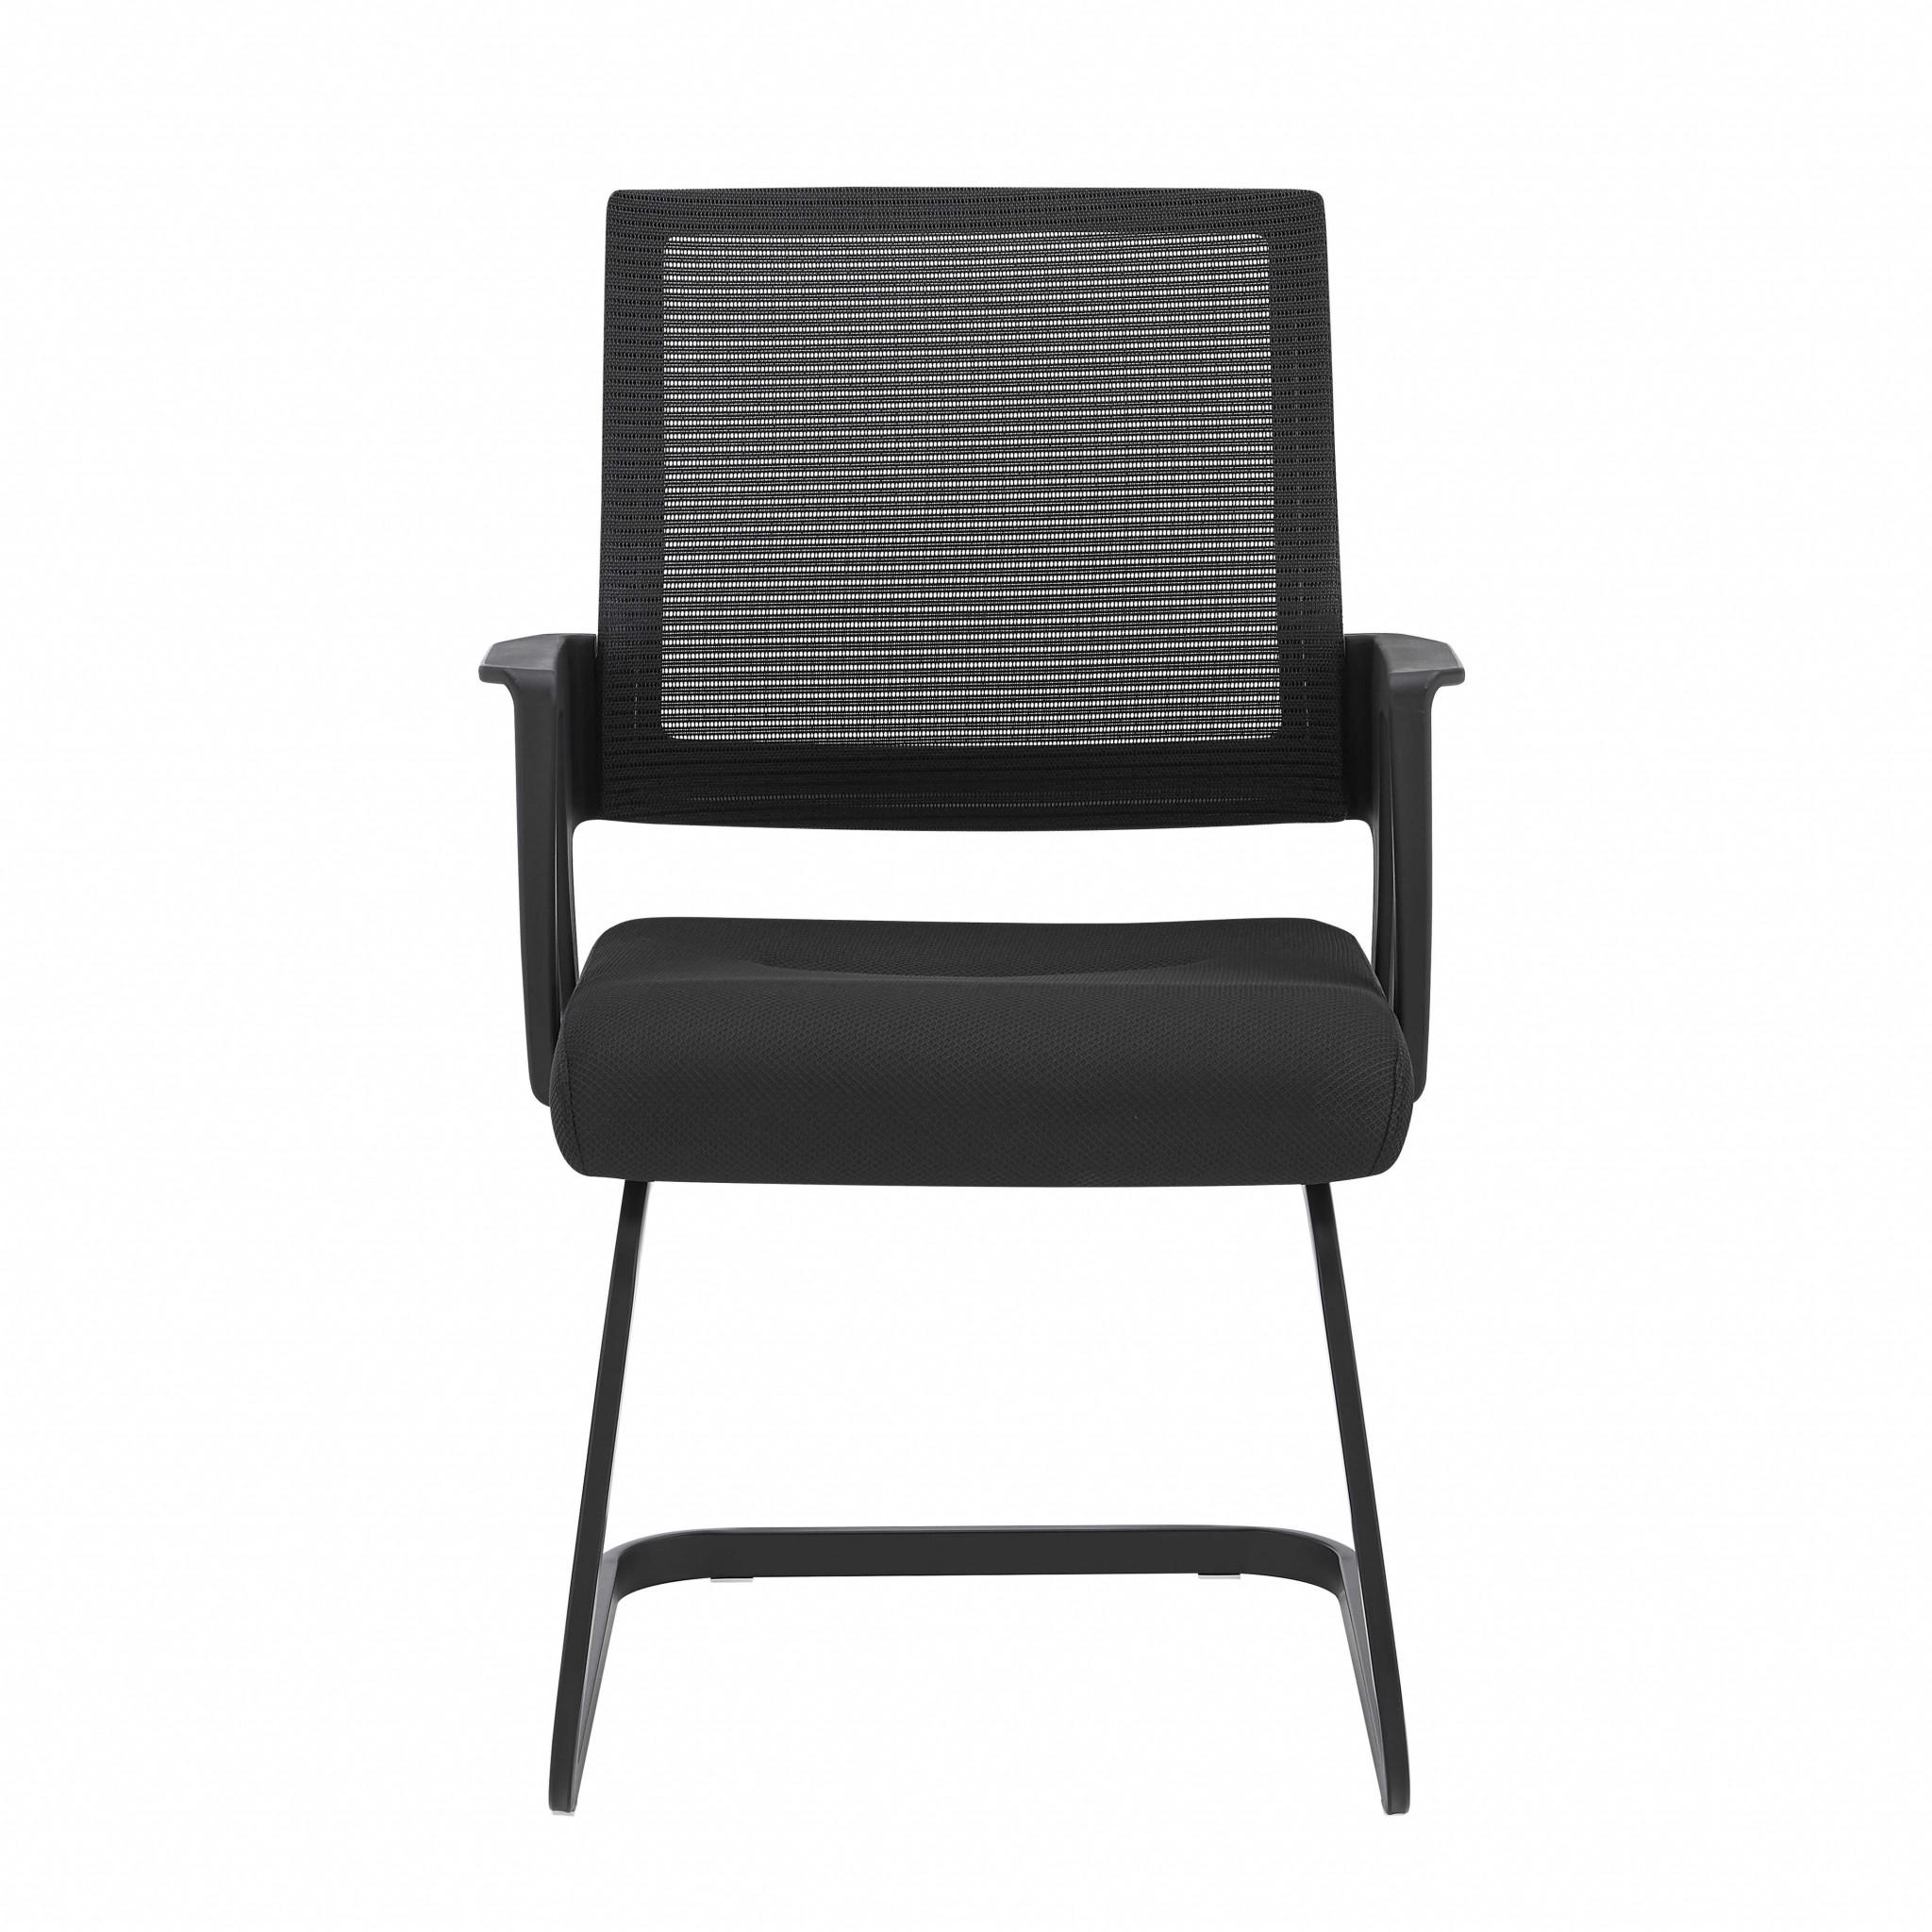 "22.01"" X 22.52"" X 34.02"" Black Fabric/Mesh Visitor Chair"